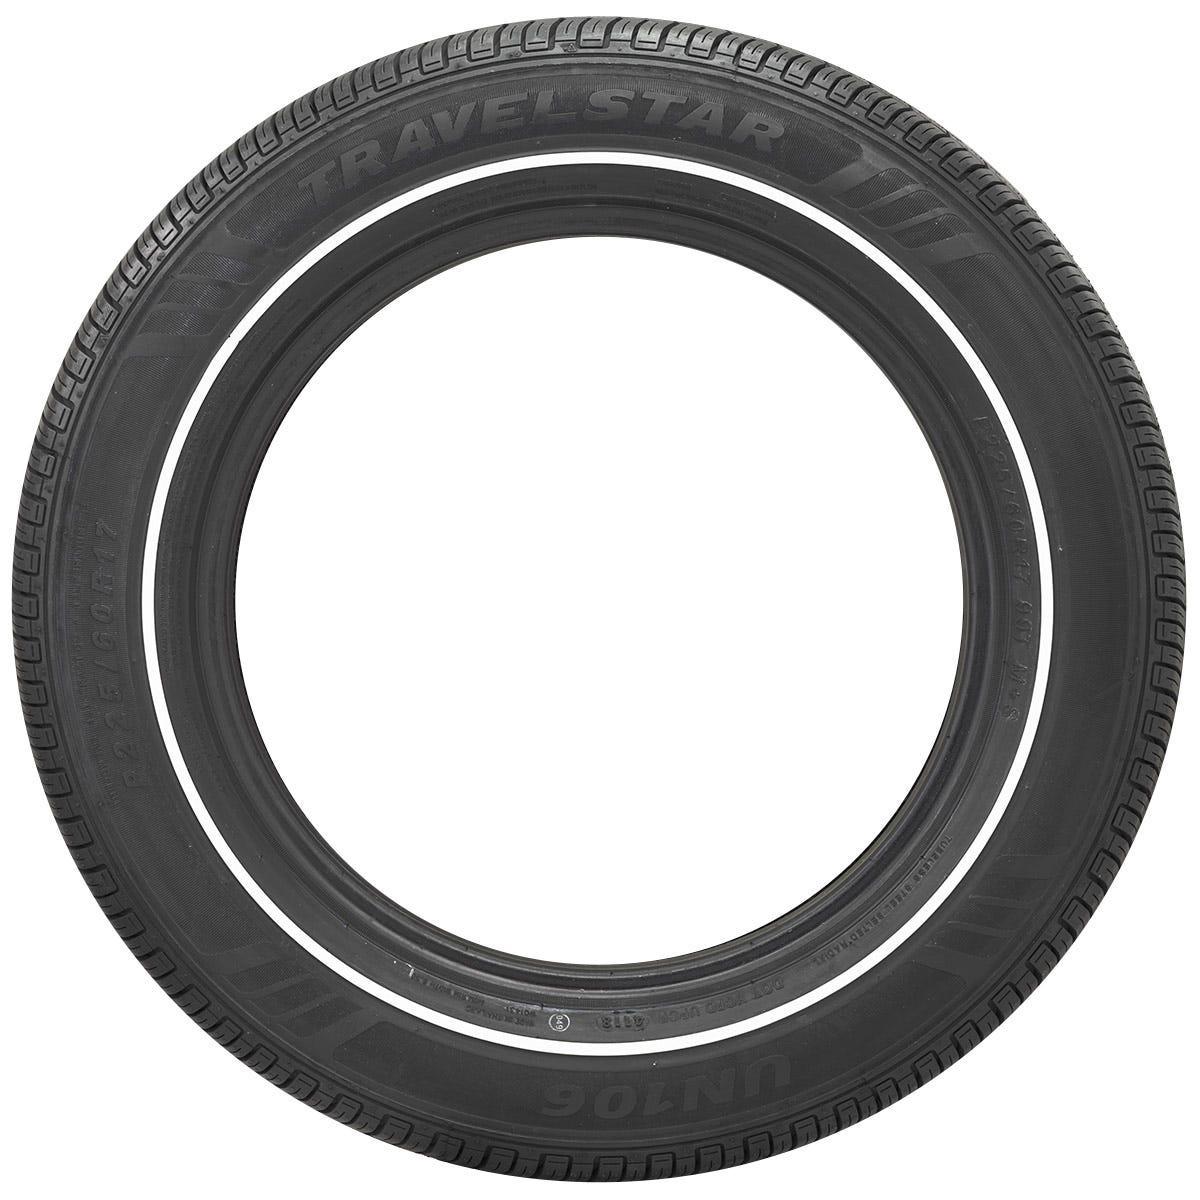 Travelstar tires